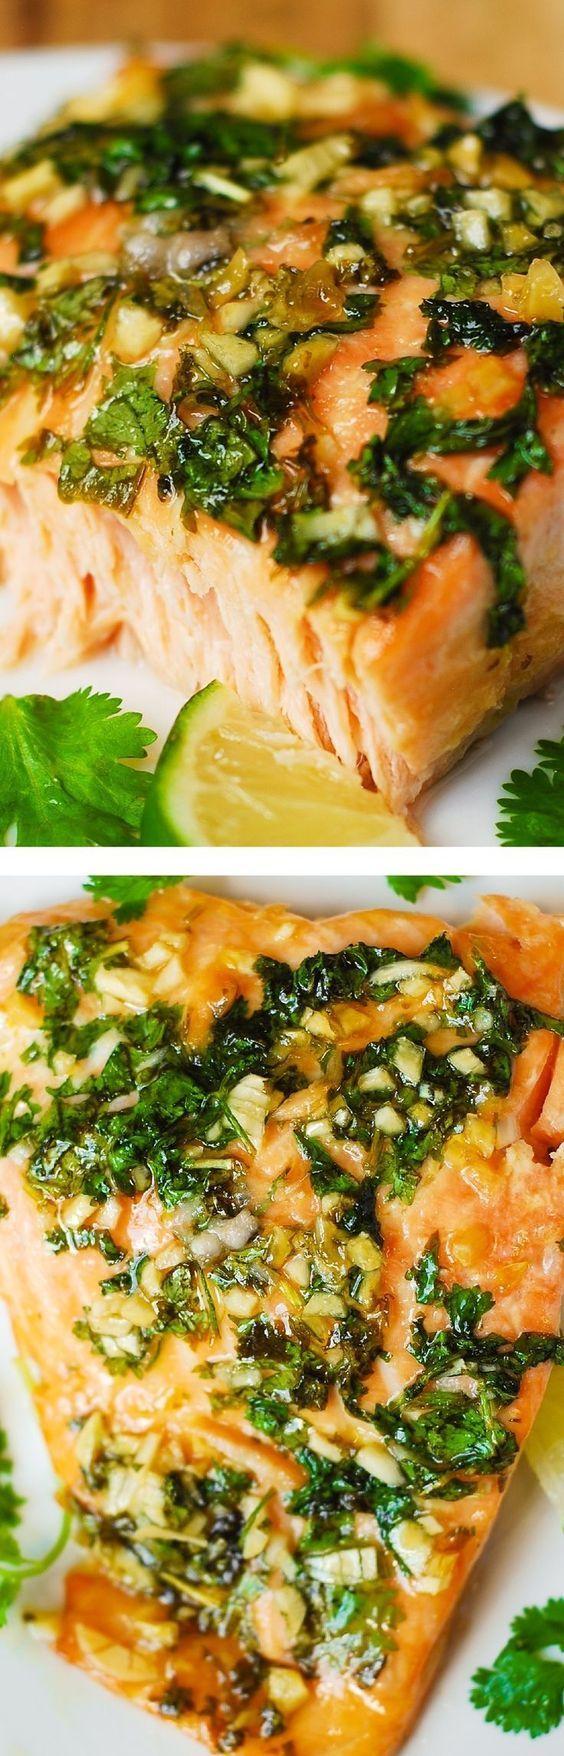 Cilantro-Lime Honey Garlic Salmon Recipe (baked in foil)